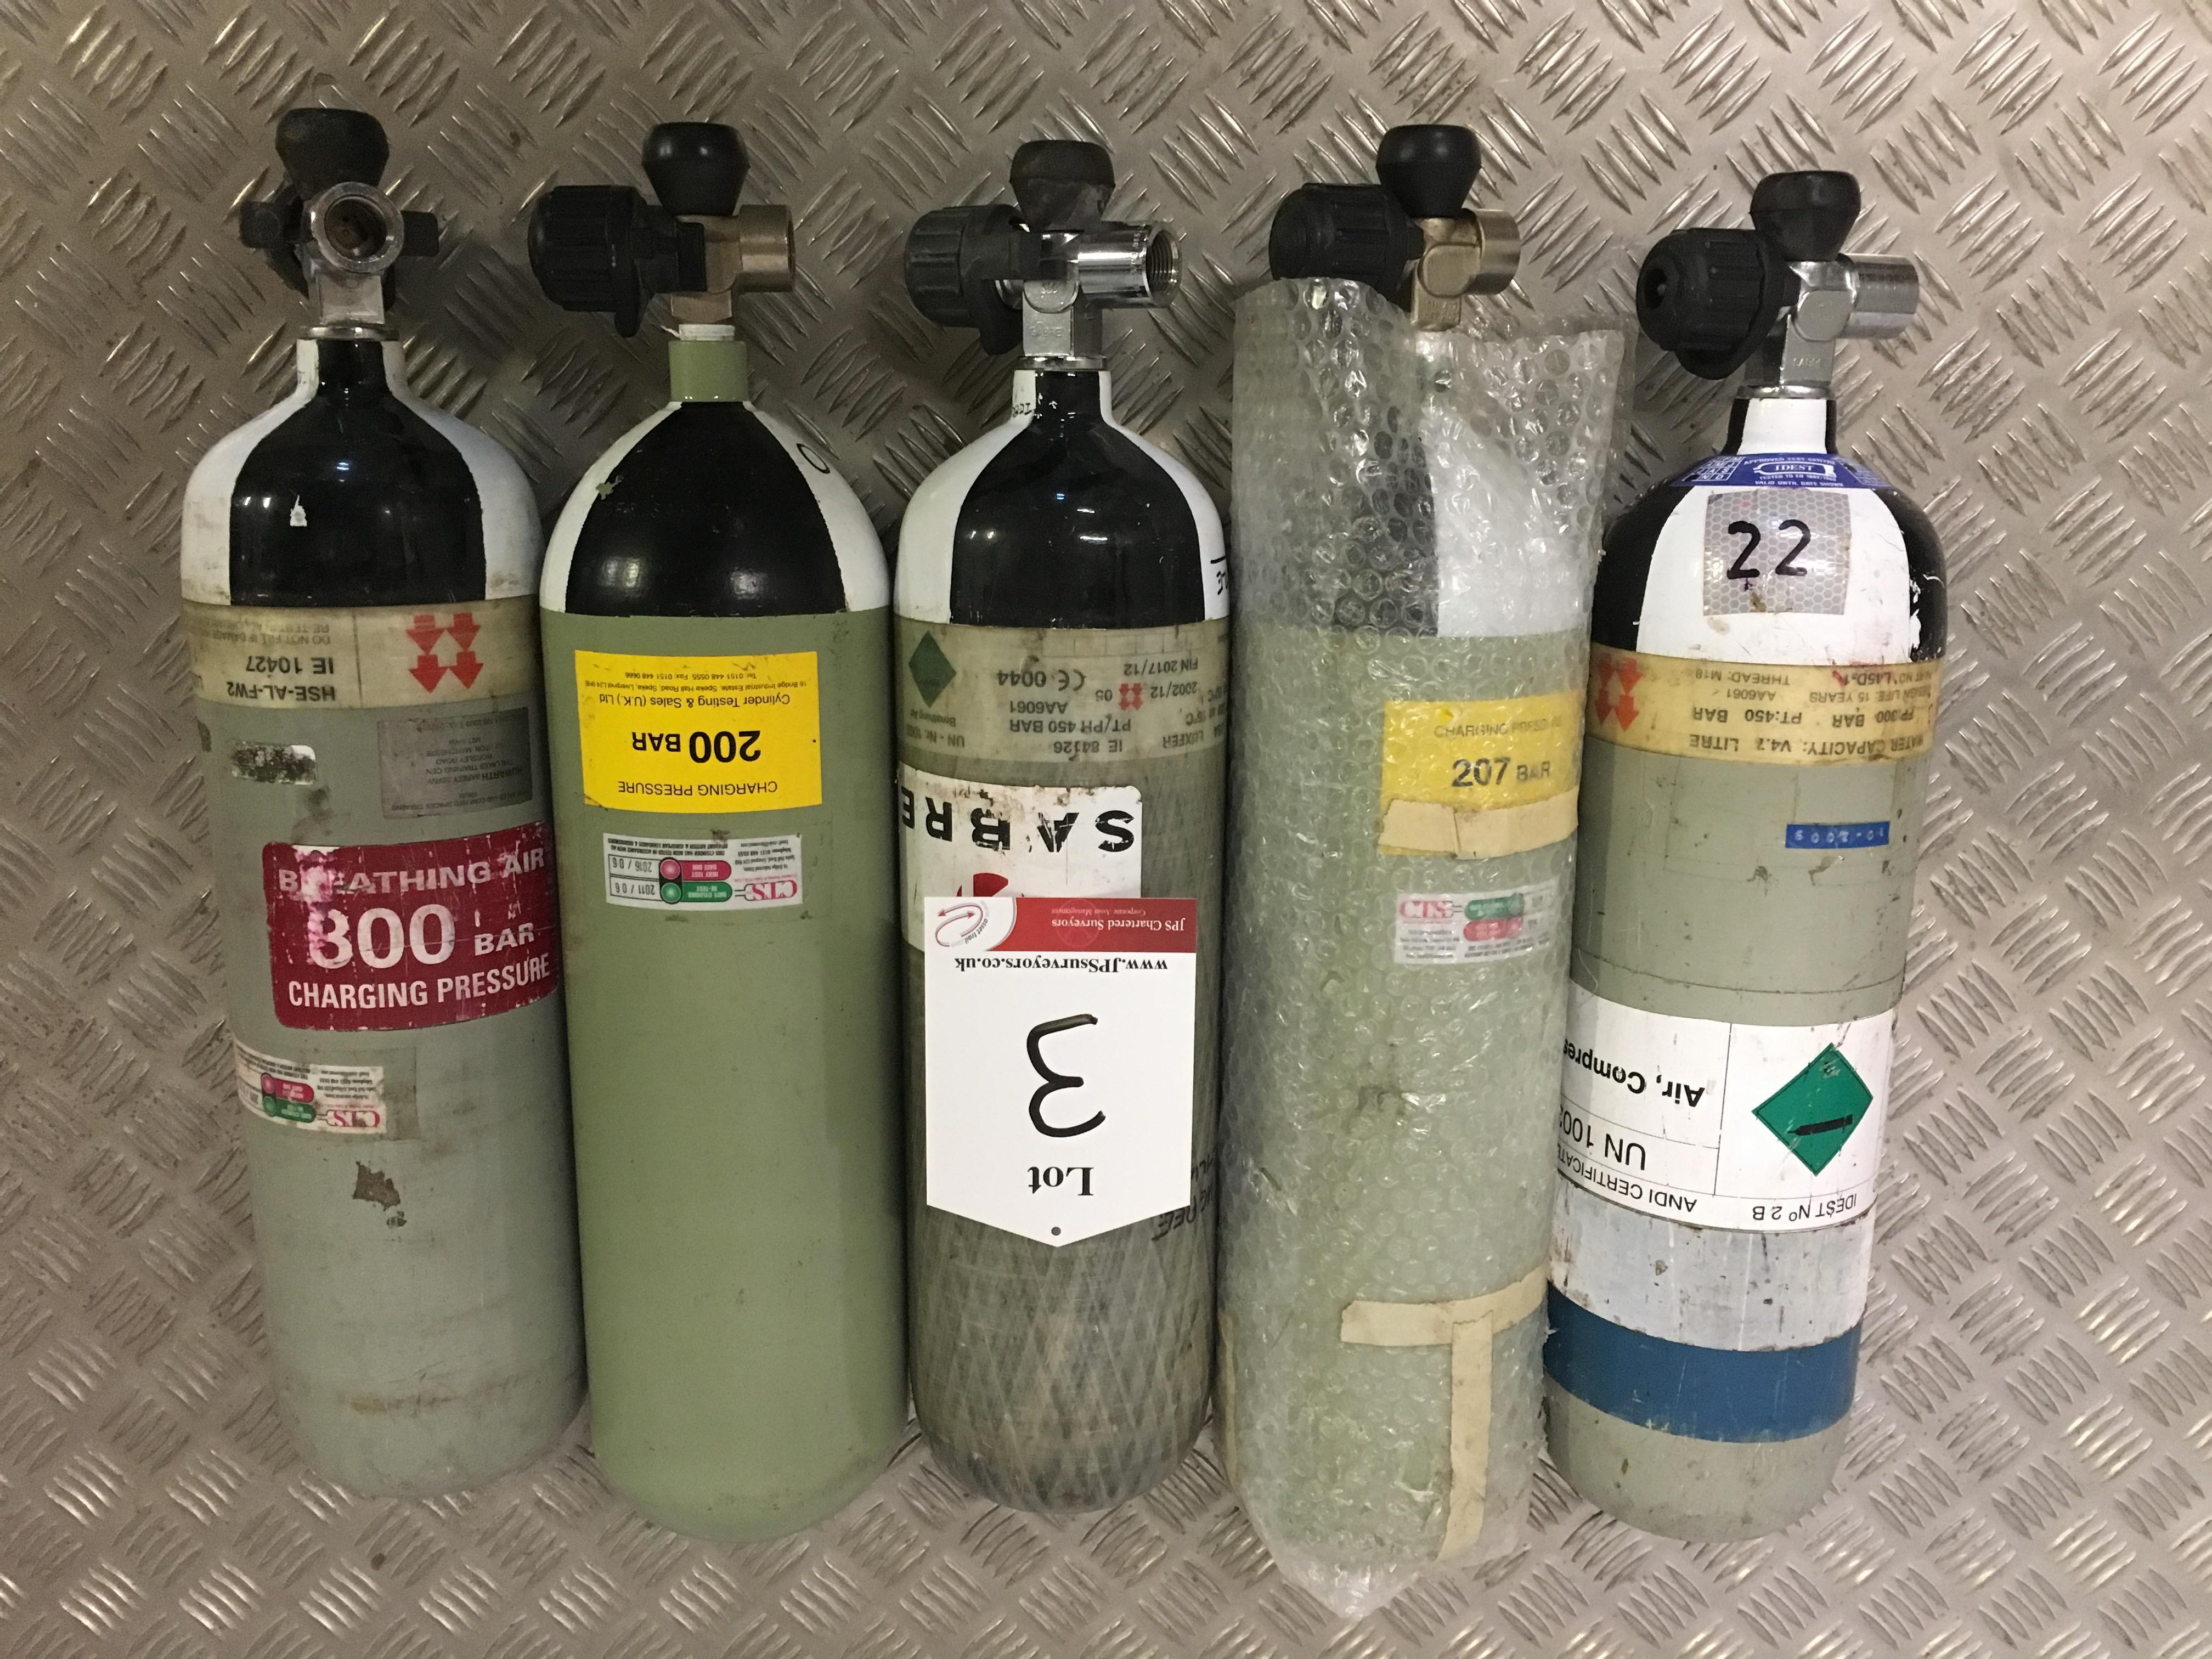 Lot 3 - 5 x Sabre 200 Bar Compressed Air Cylinder with Saver Valves